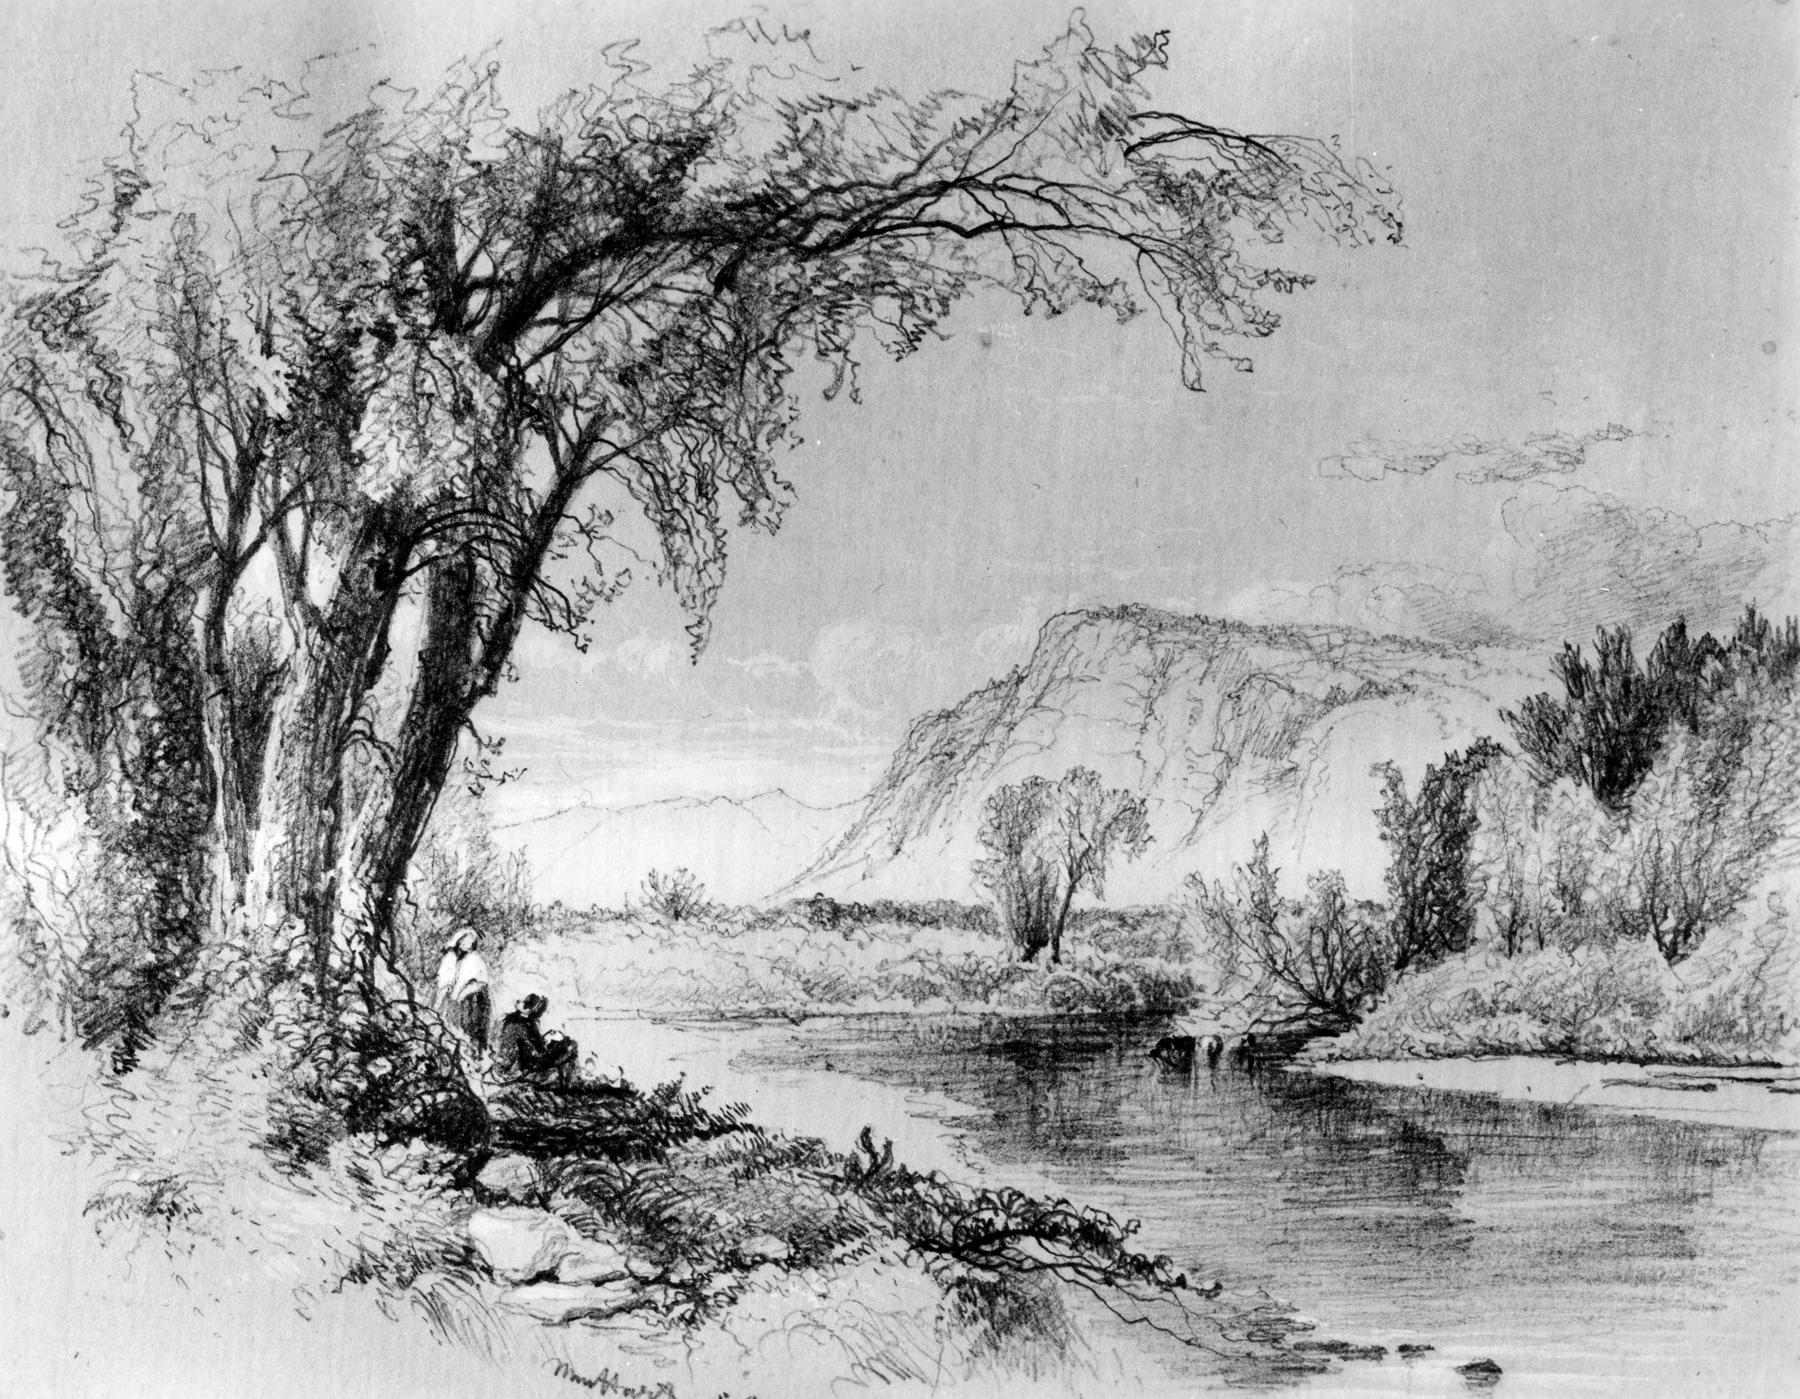 Filewilliam m hart mountain and river scene walters 371558 jpg